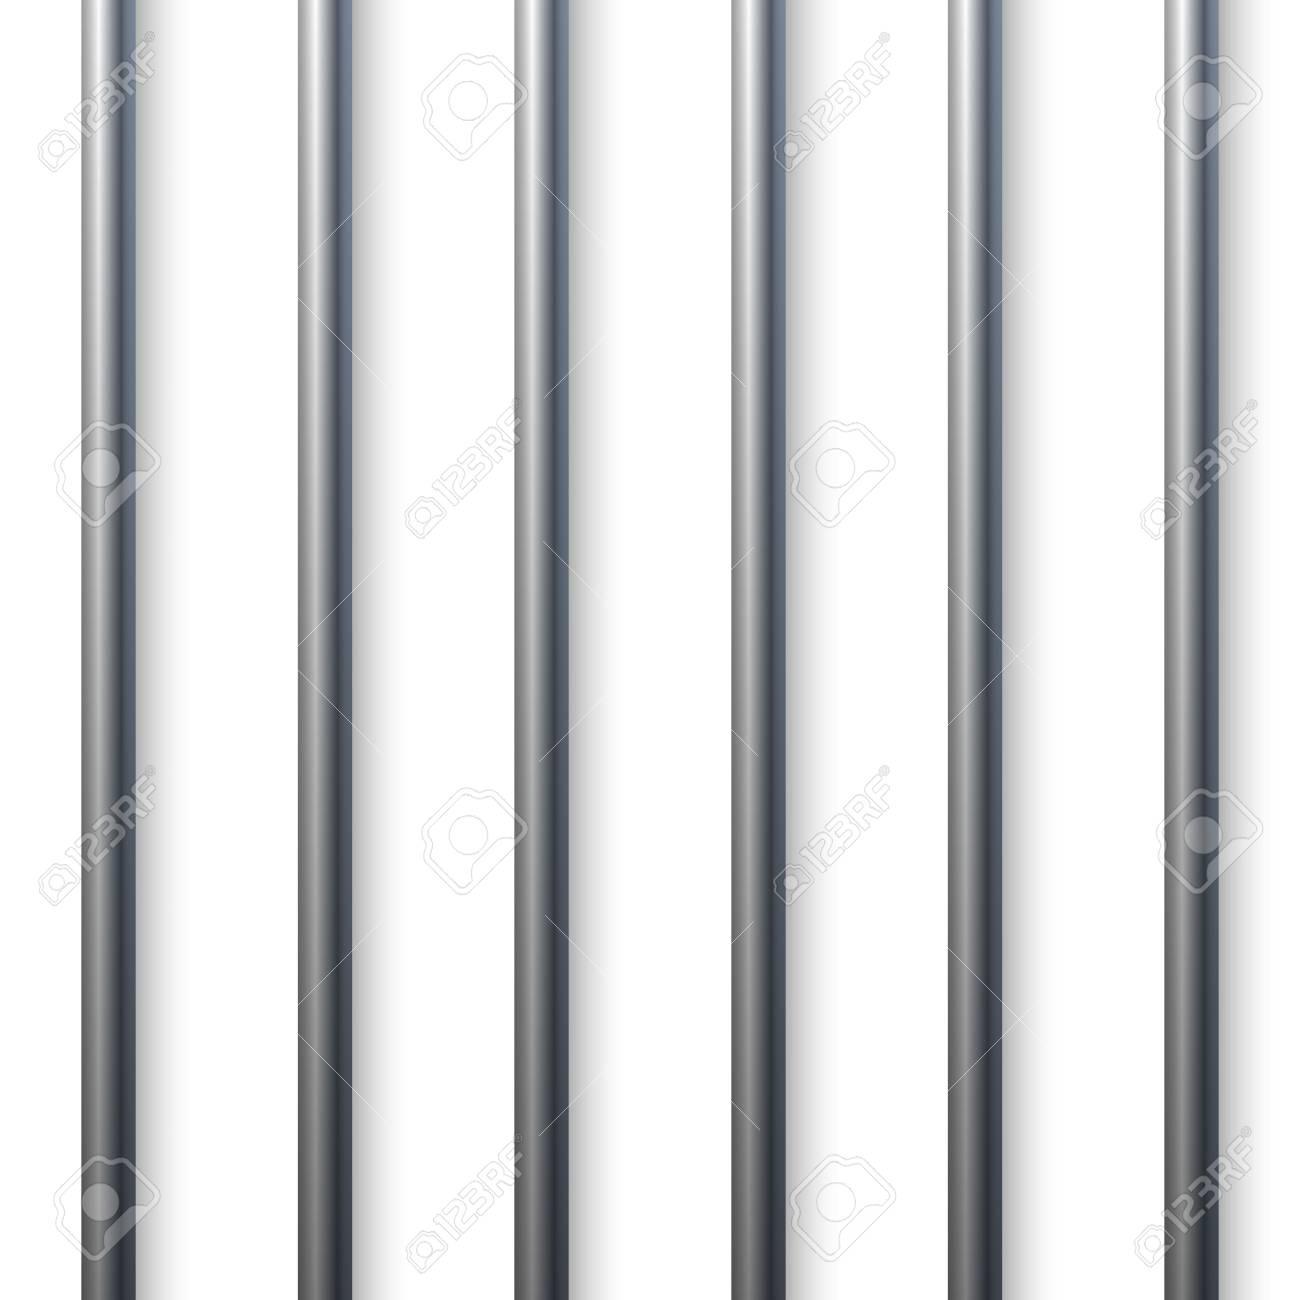 Prison Cell Bars.